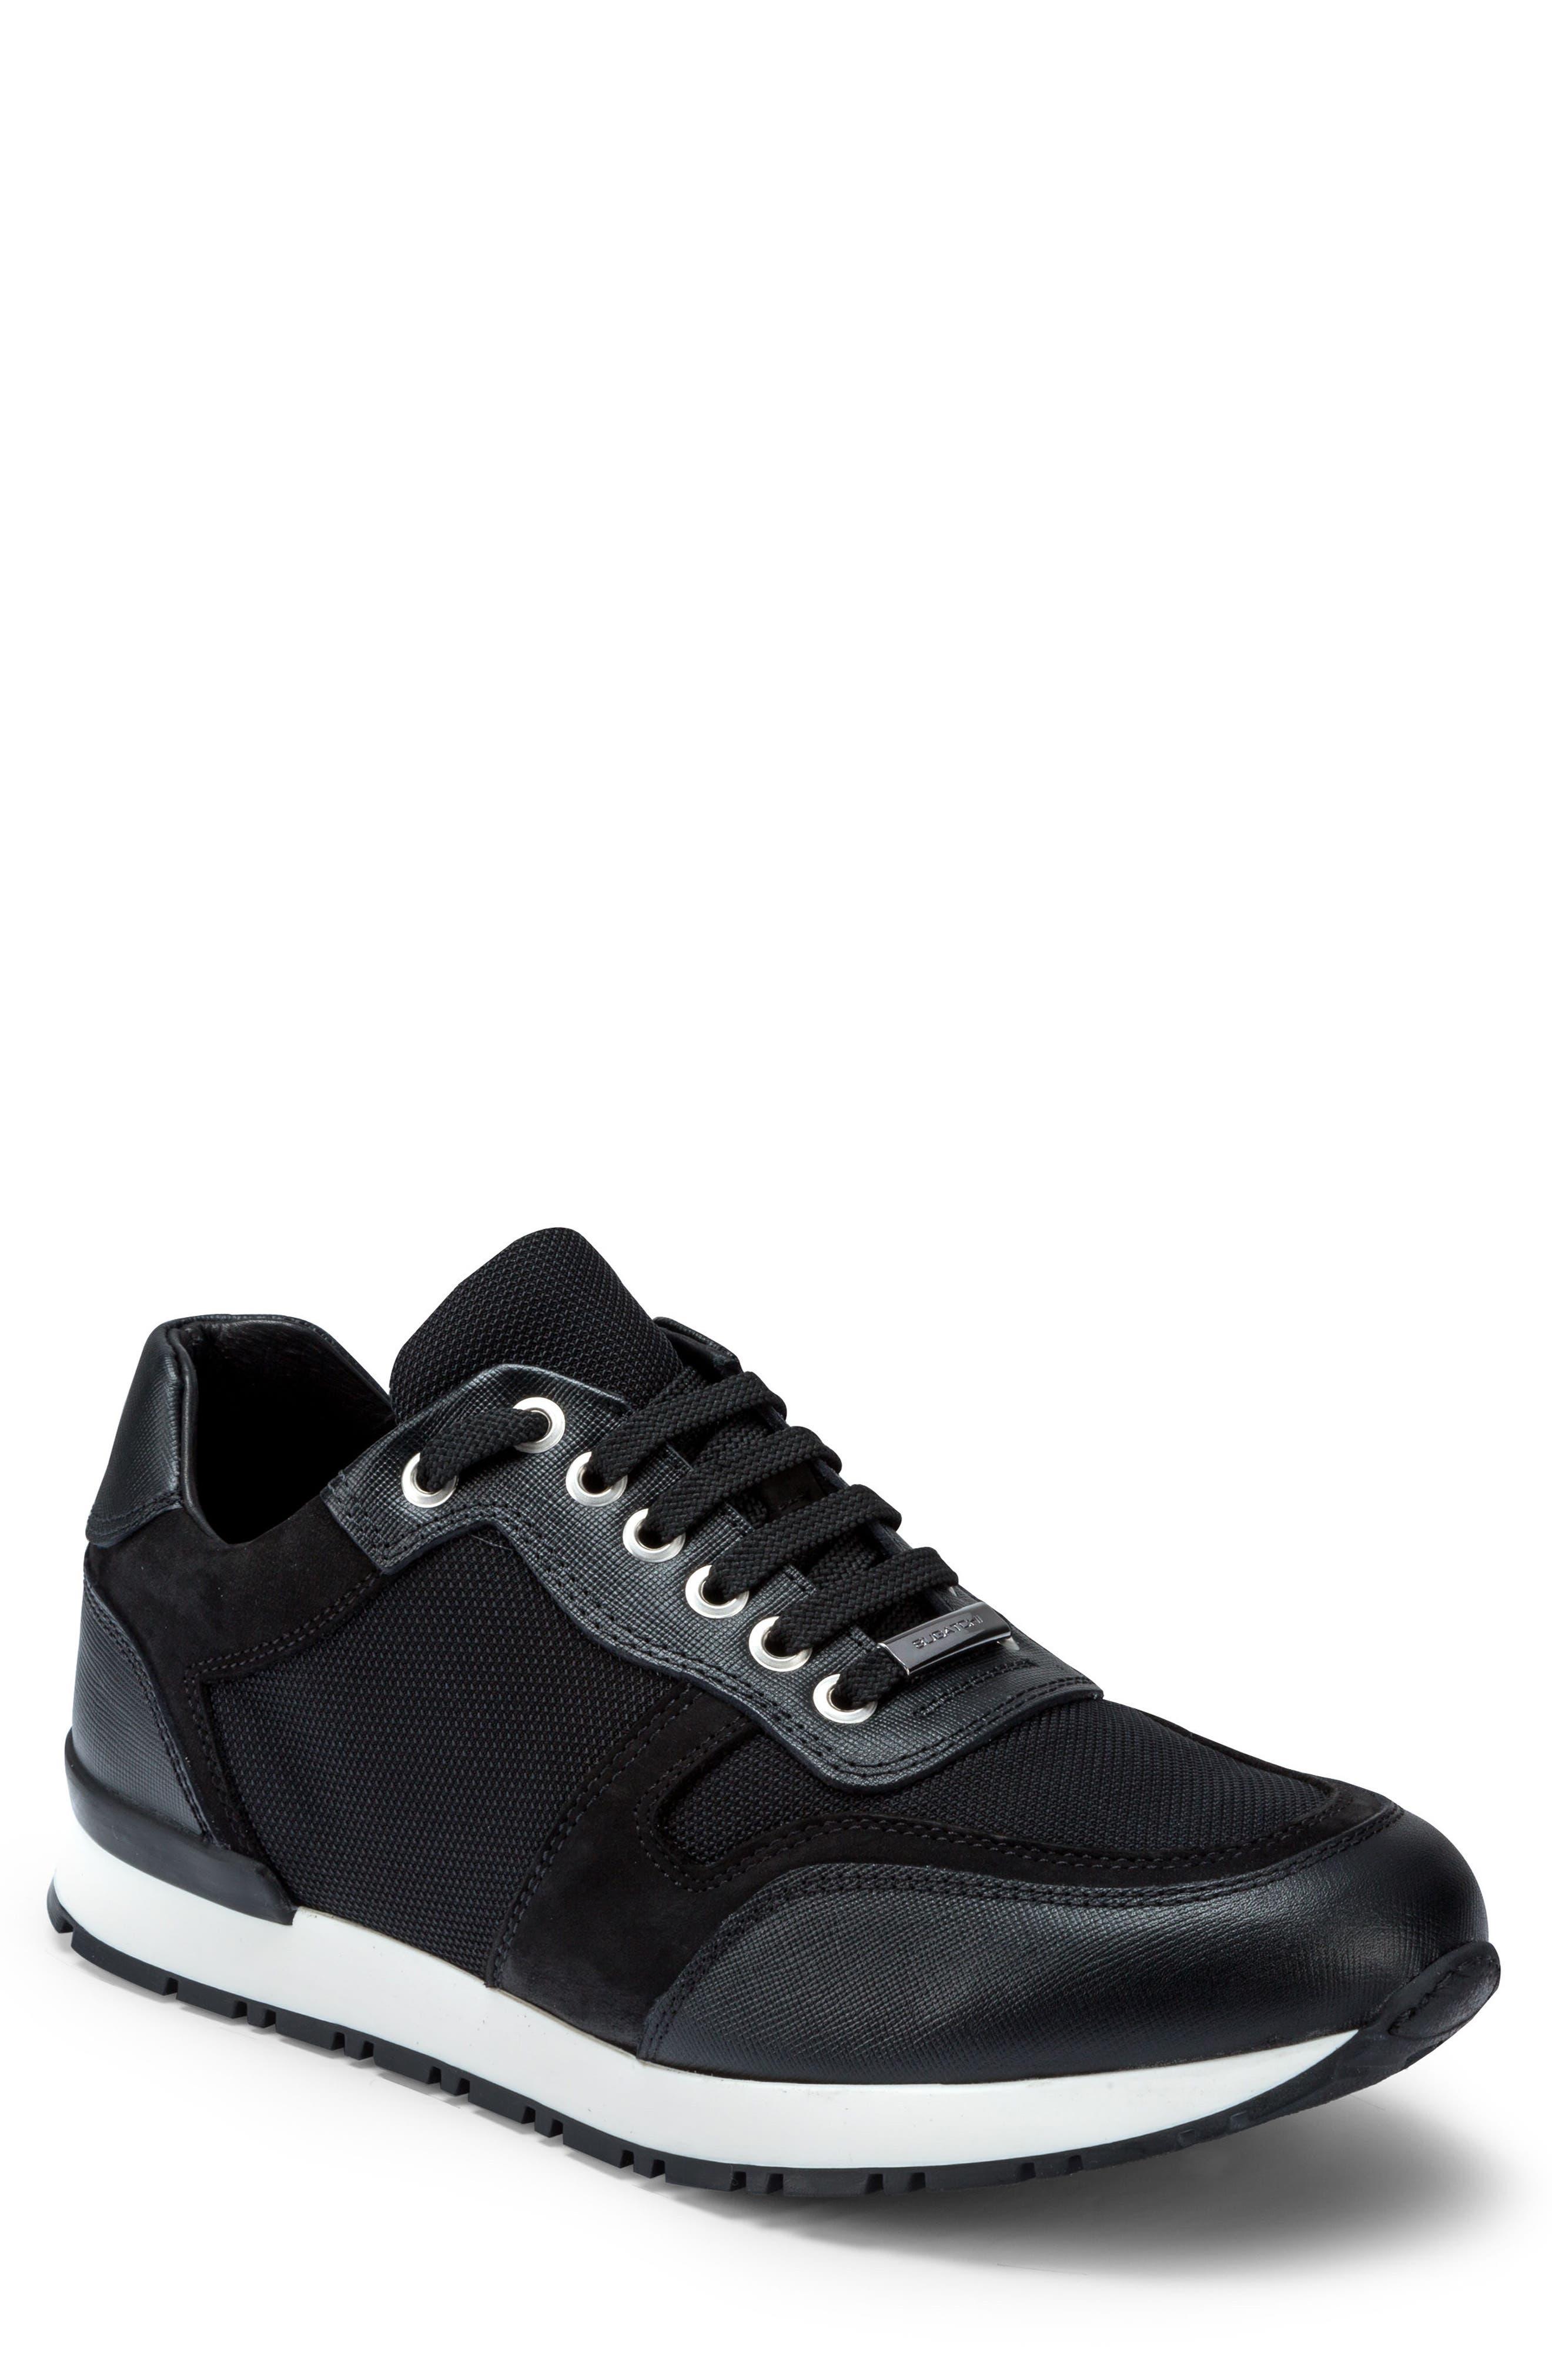 Modena Sneaker,                             Main thumbnail 1, color,                             001